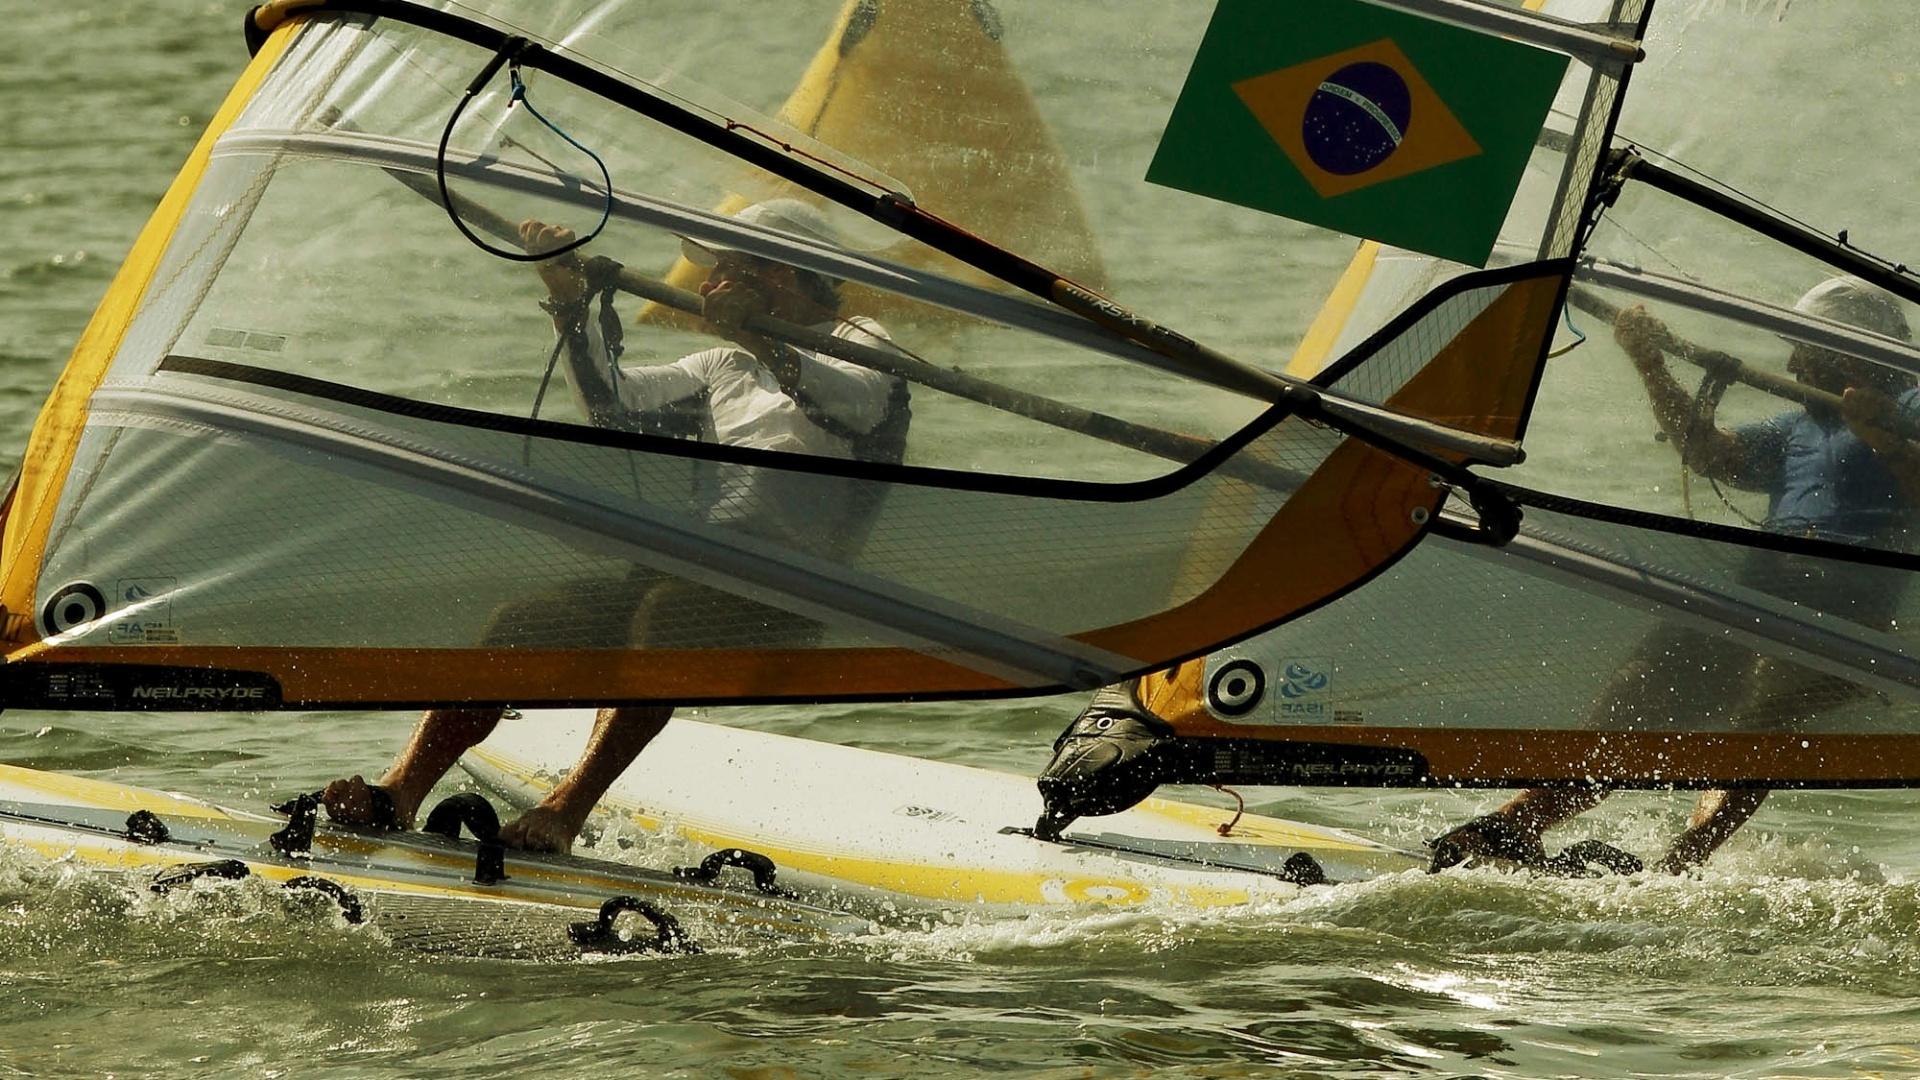 Ricardo Winnick, o Bimba, disputa regata da classe RS-X masculina dos Jogos Pan-Americanos de Guadalajara (19/10/2011)